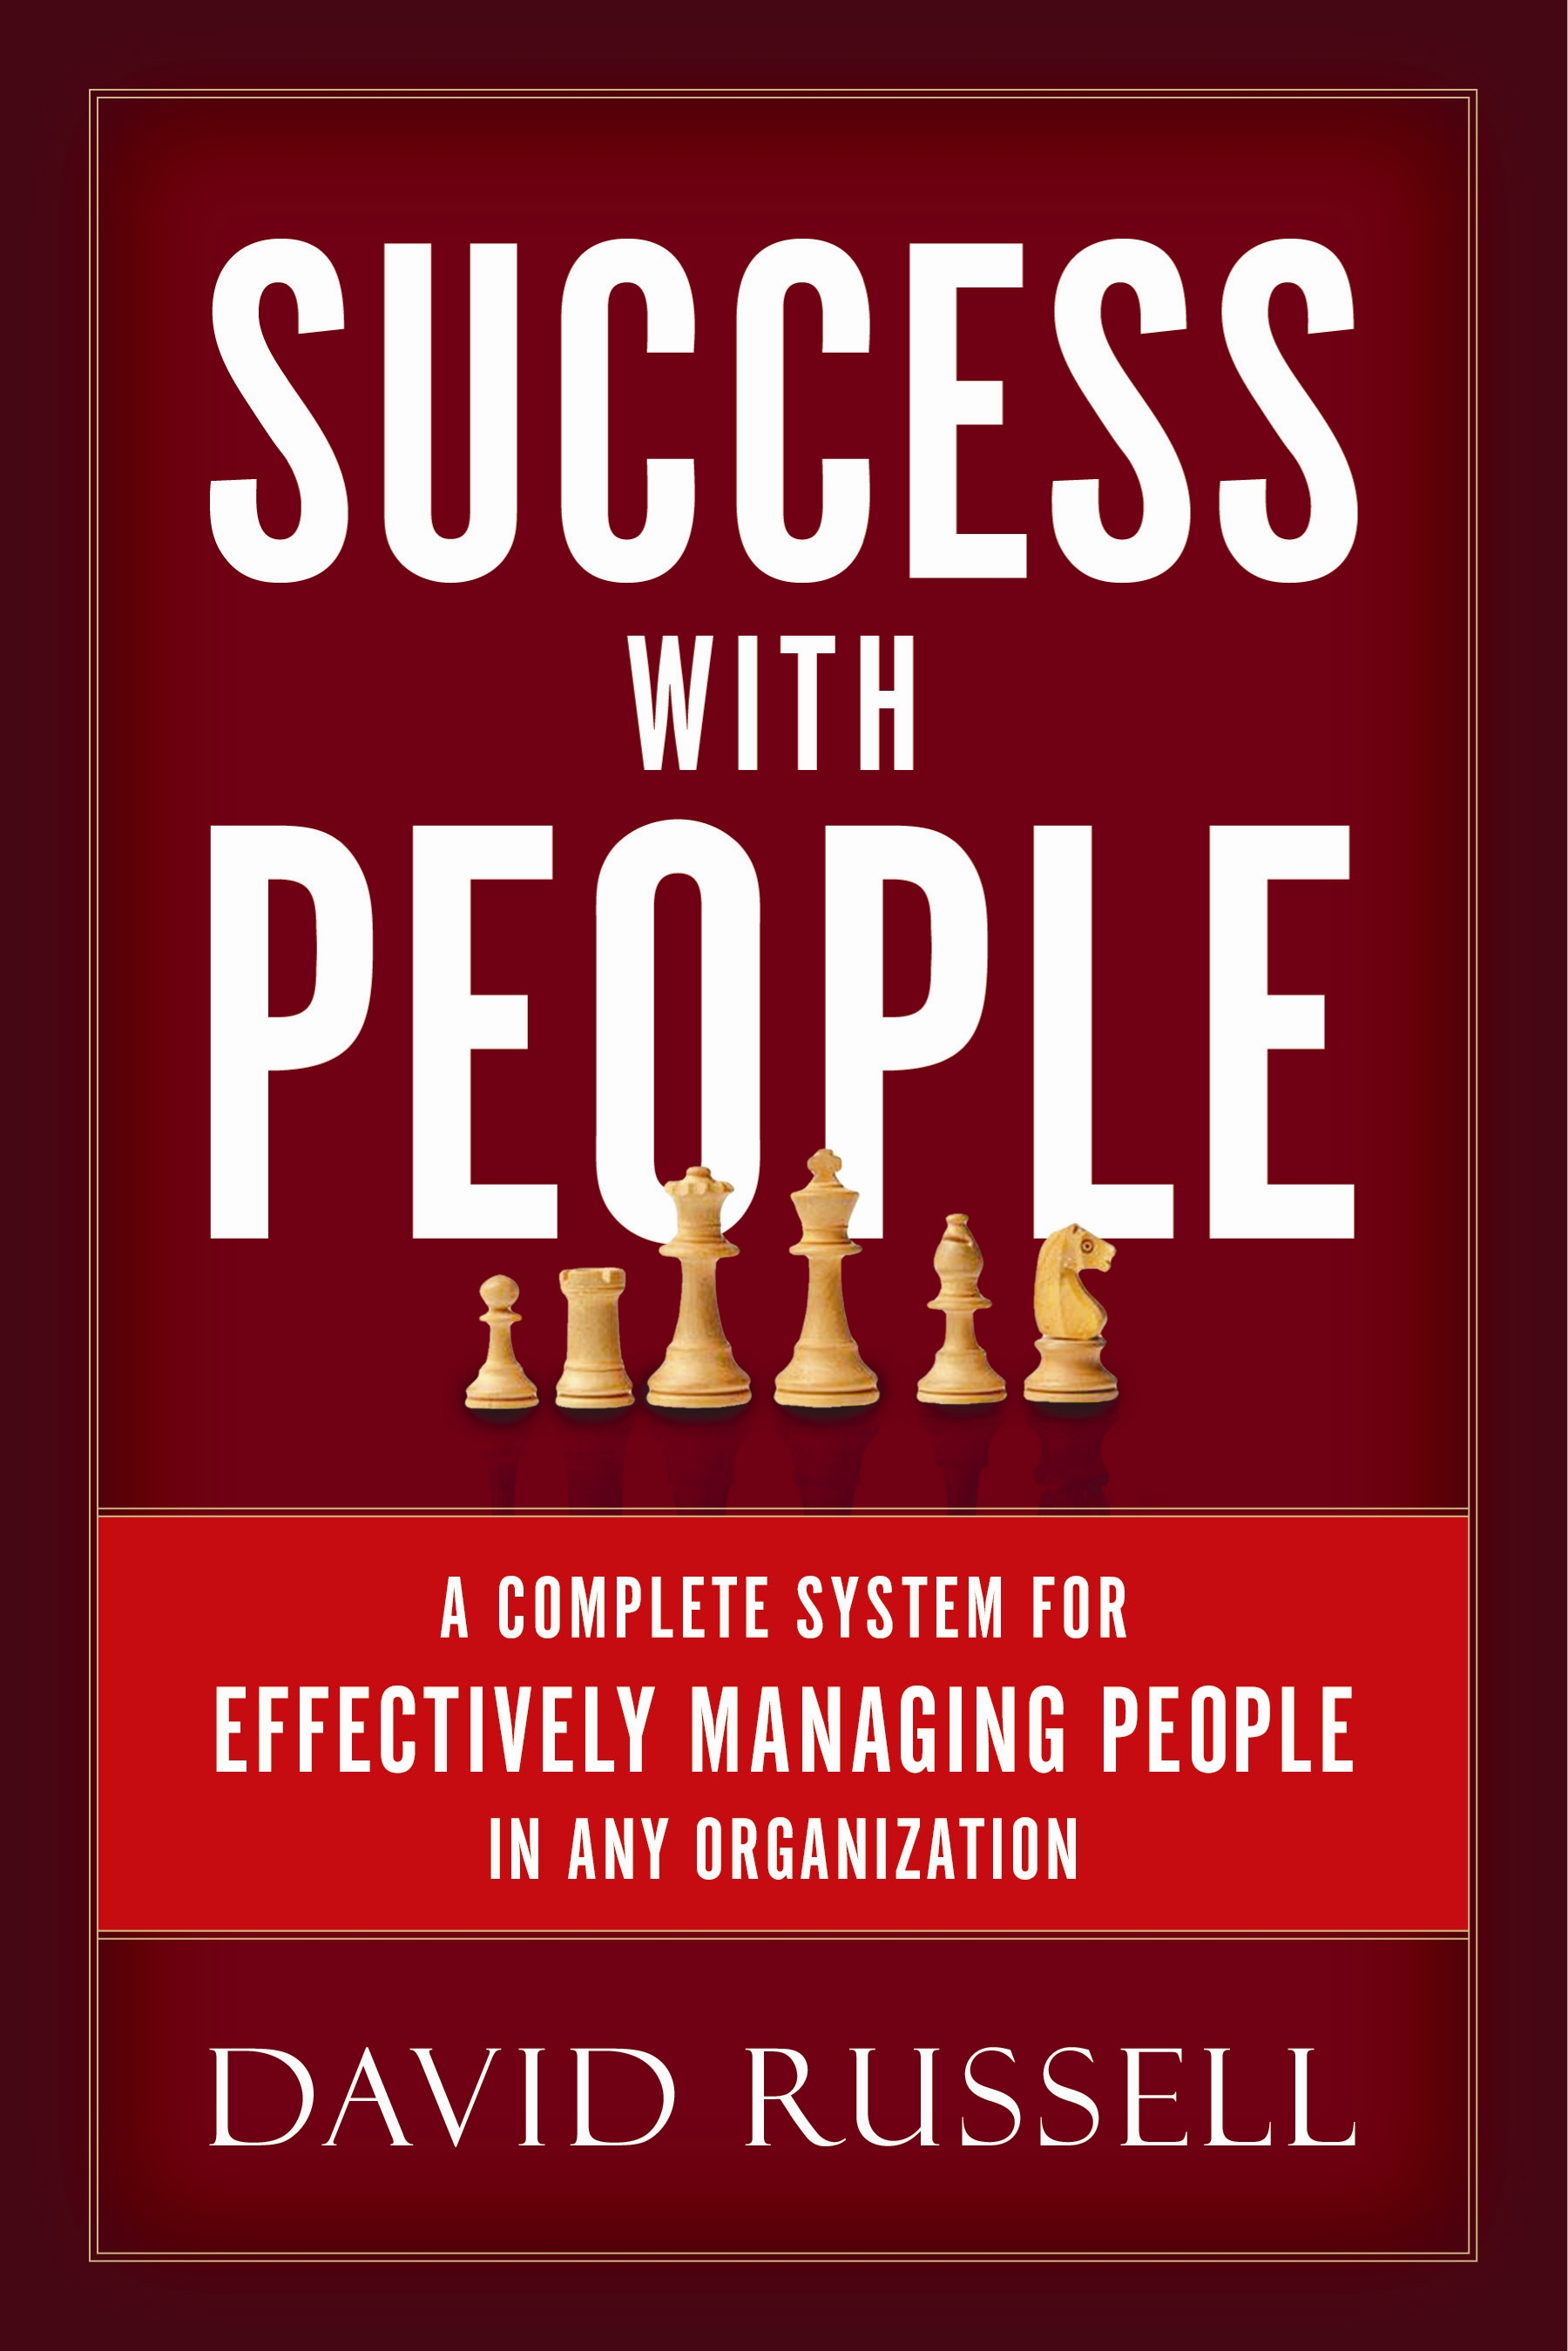 SWP - Book Cover.JPG